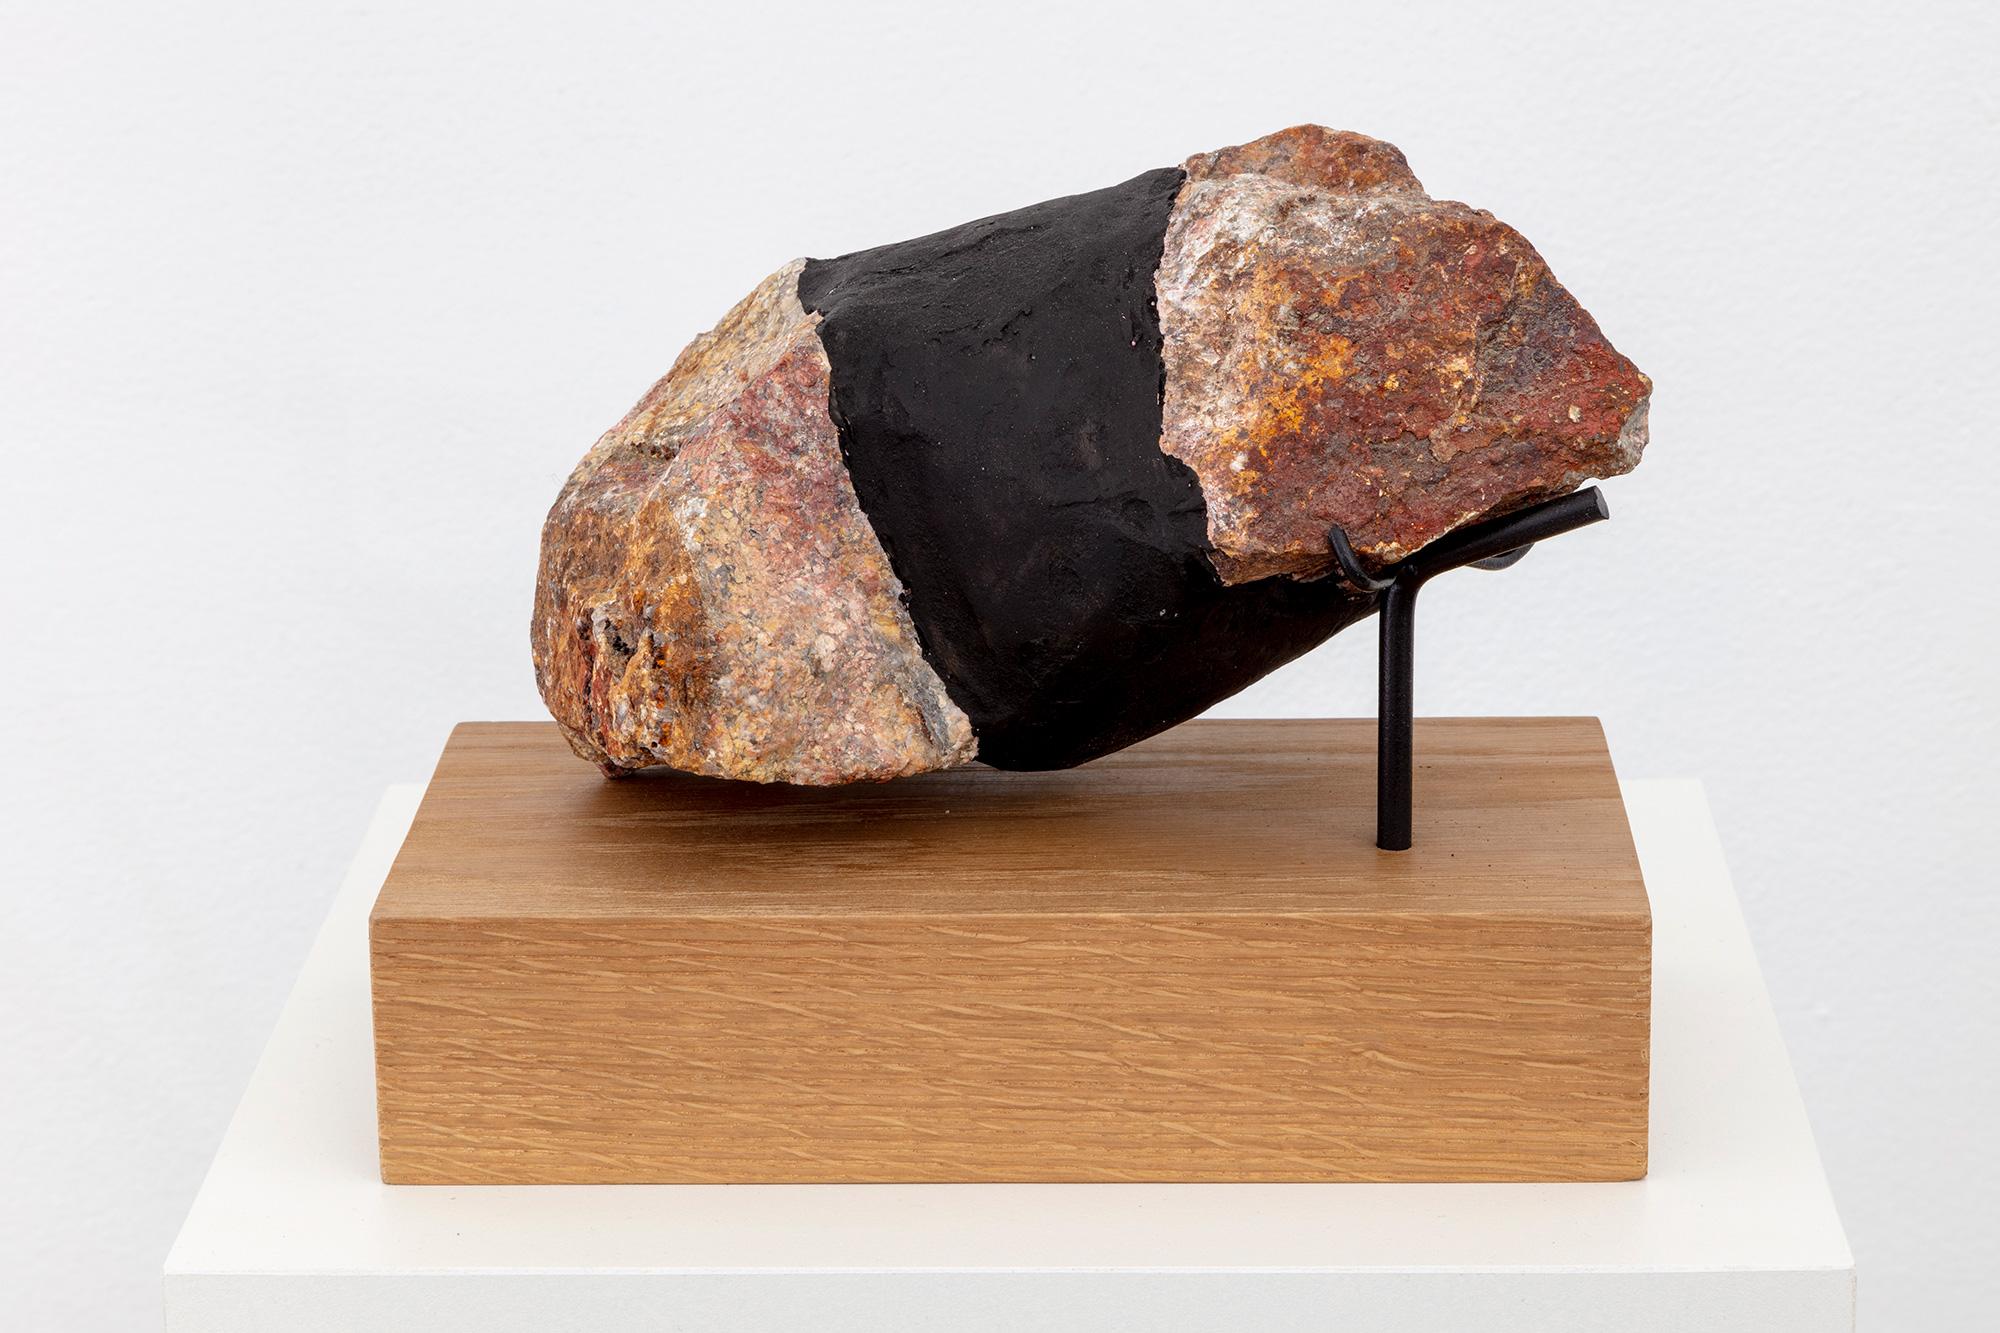 Sculpture with rock on wooden pedestal